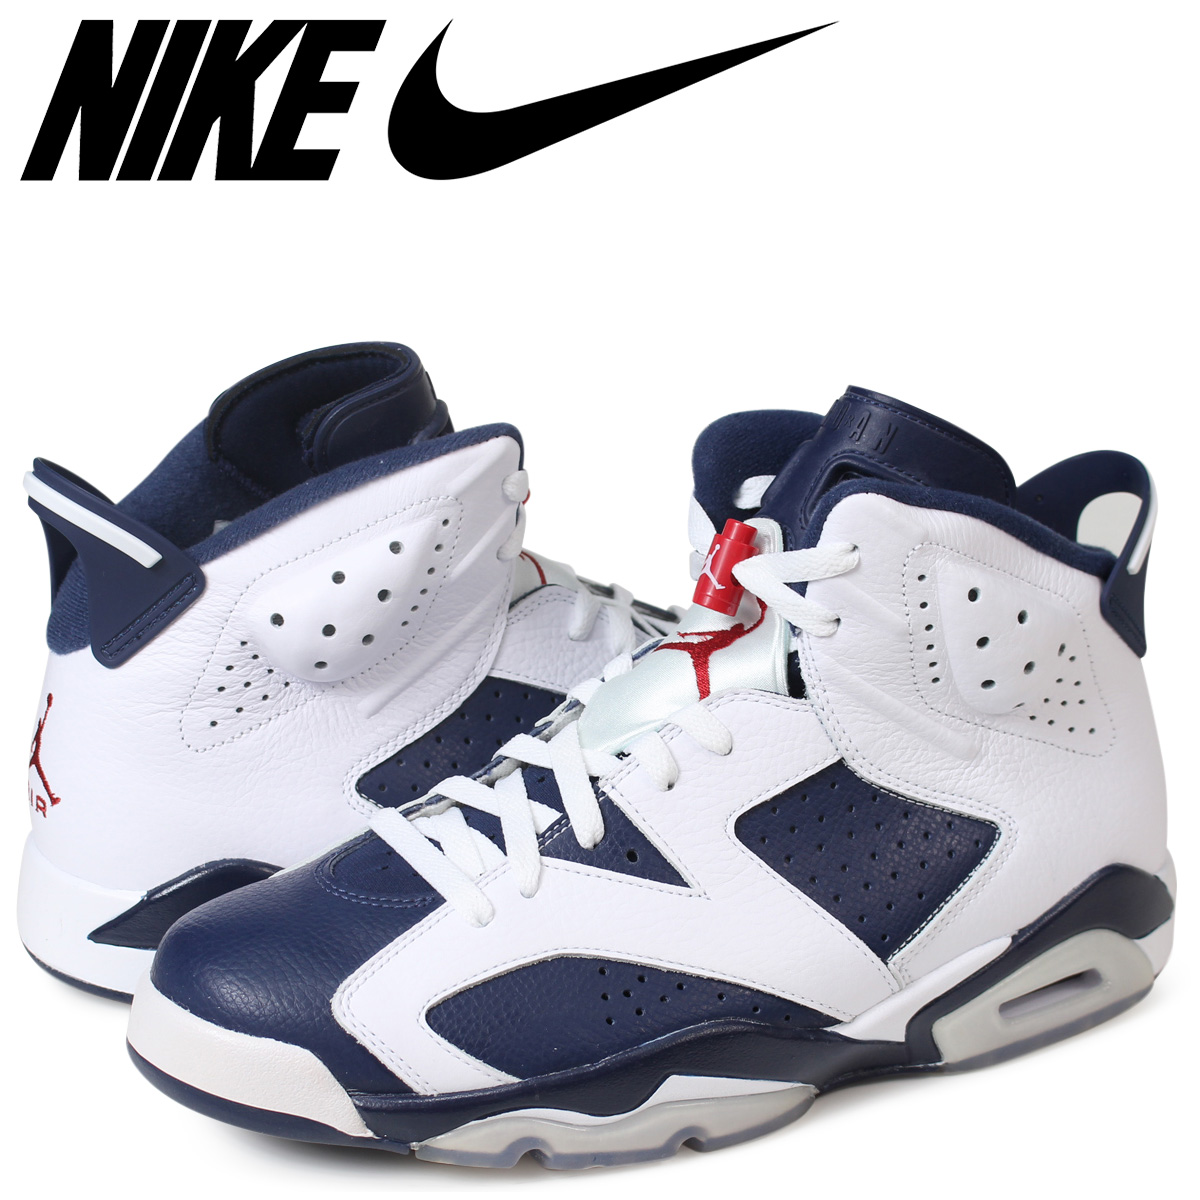 NIKE AIR JORDAN 6 RETRO OLYMPIC Nike Air Jordan 6 nostalgic sneakers  384 dd1953f13